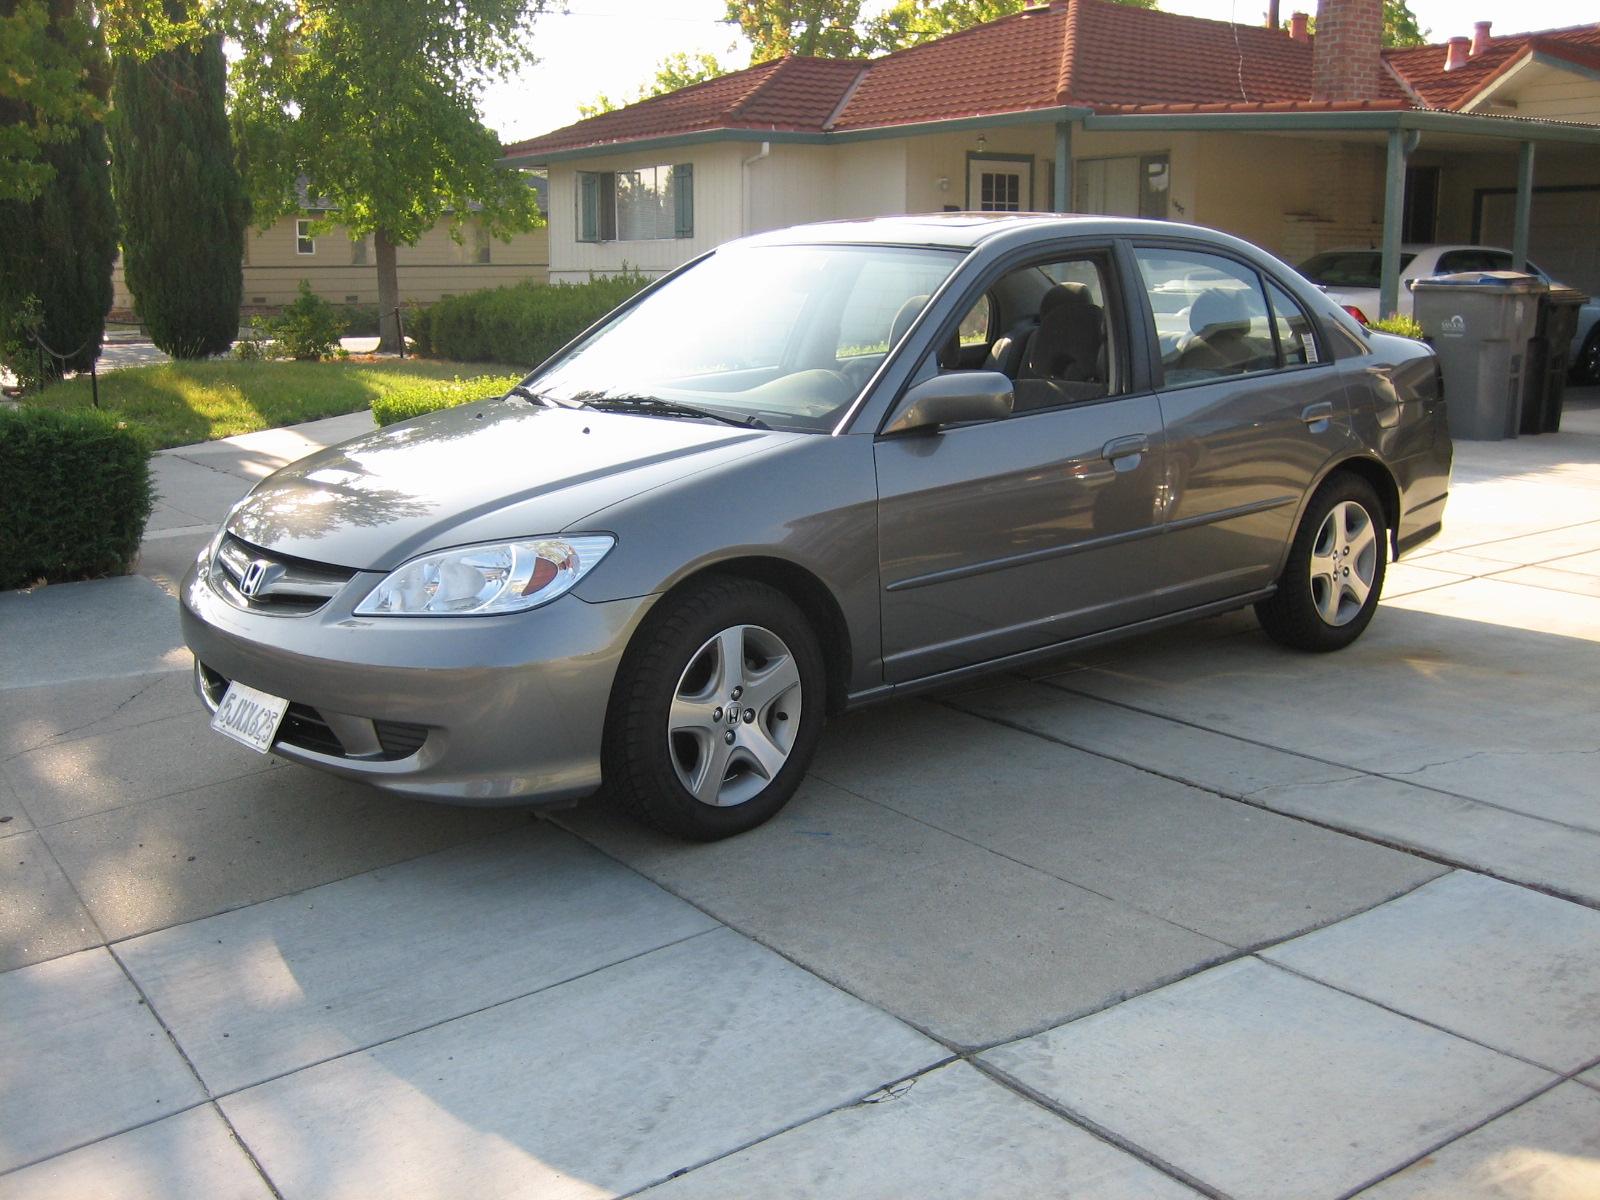 2004 Honda Civic Coupe Car Interior Design